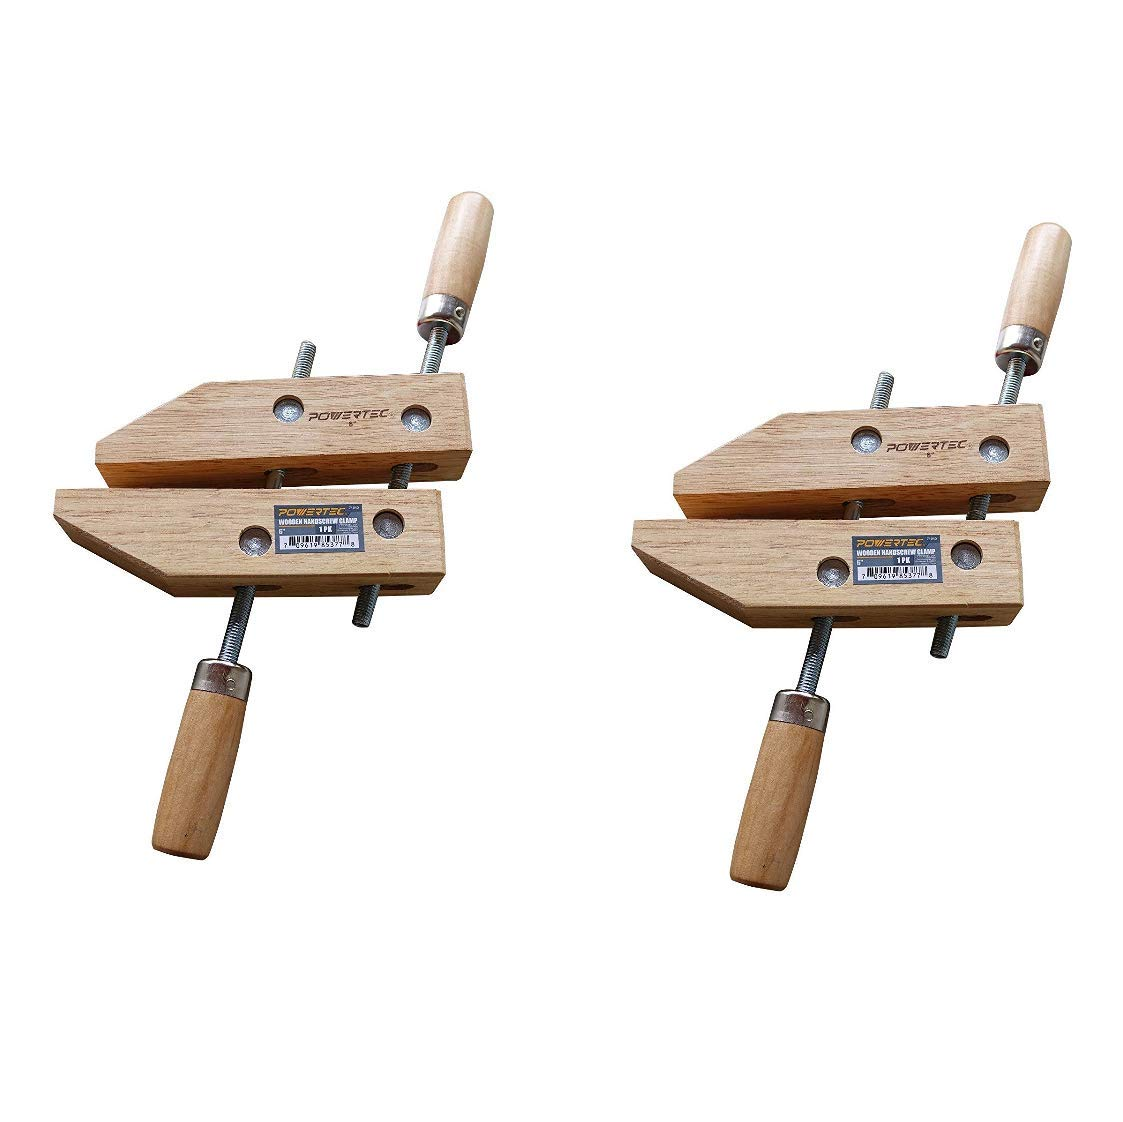 POWERTEC 71525 Wooden Handscrew Clamp - 12 Inch | Hand Screw Clamps for Woodworking, 2PK by POWERTEC